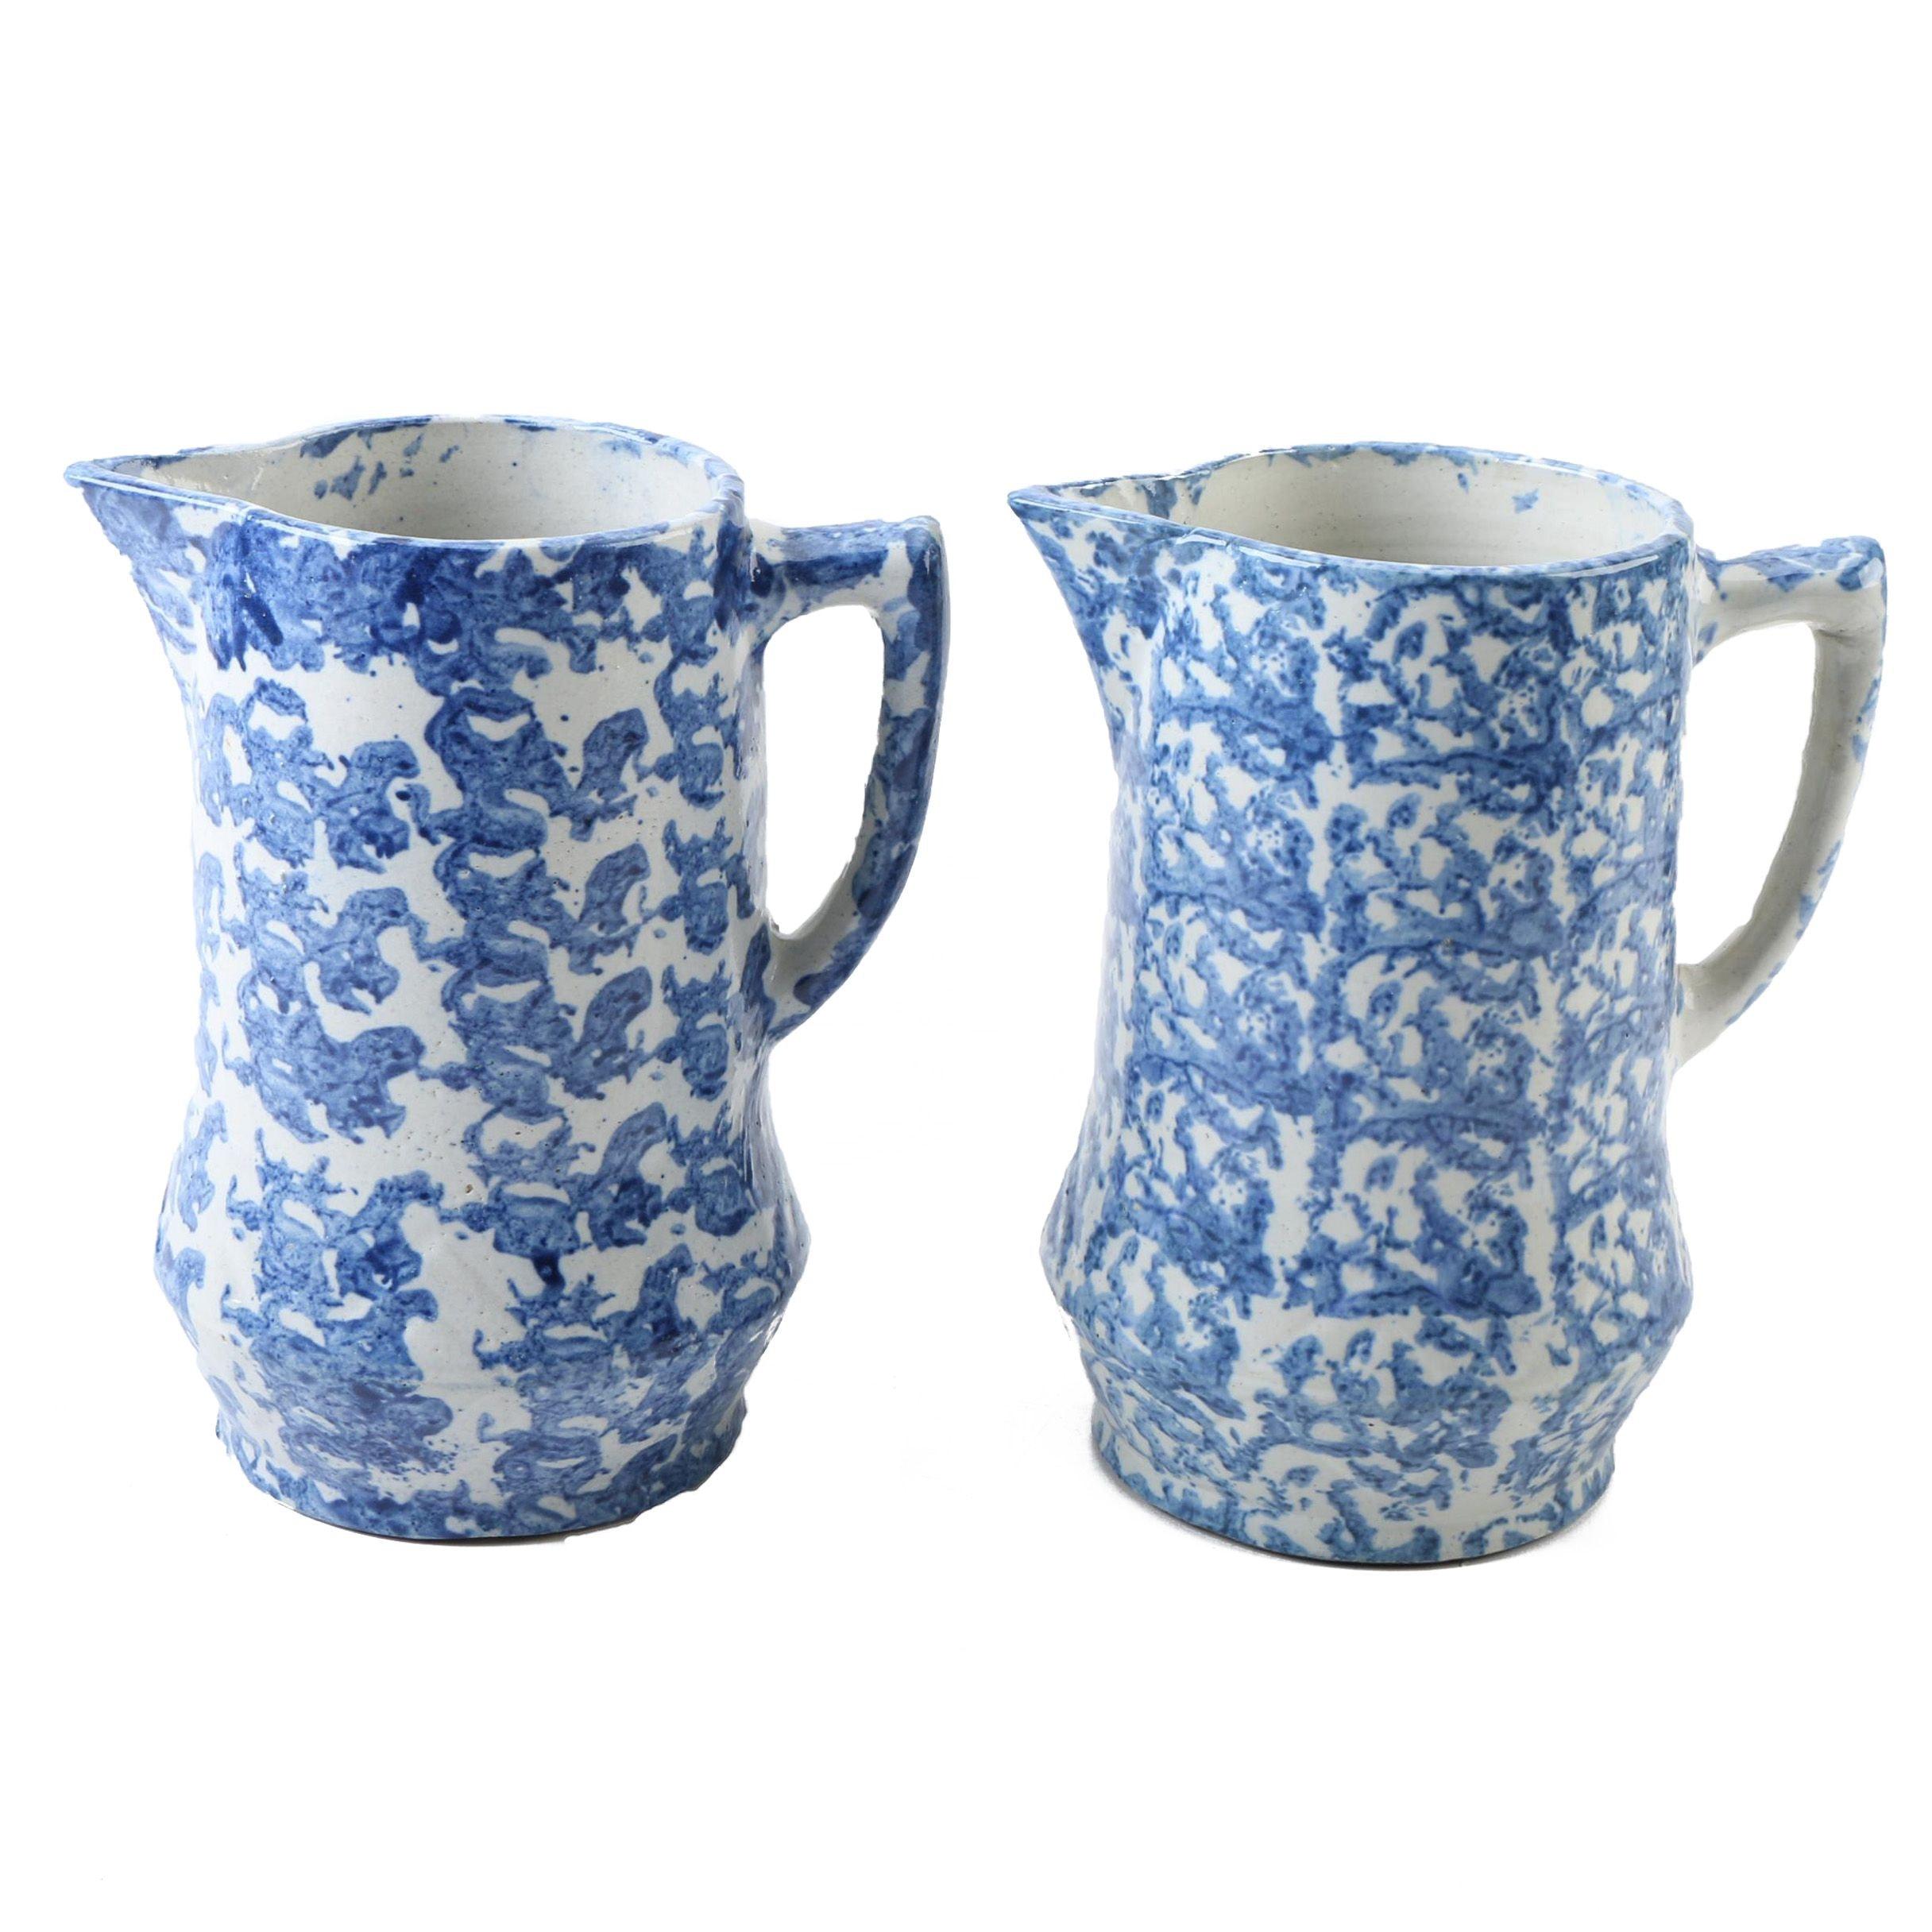 Vintage Blue Stoneware Spongeware Pitchers